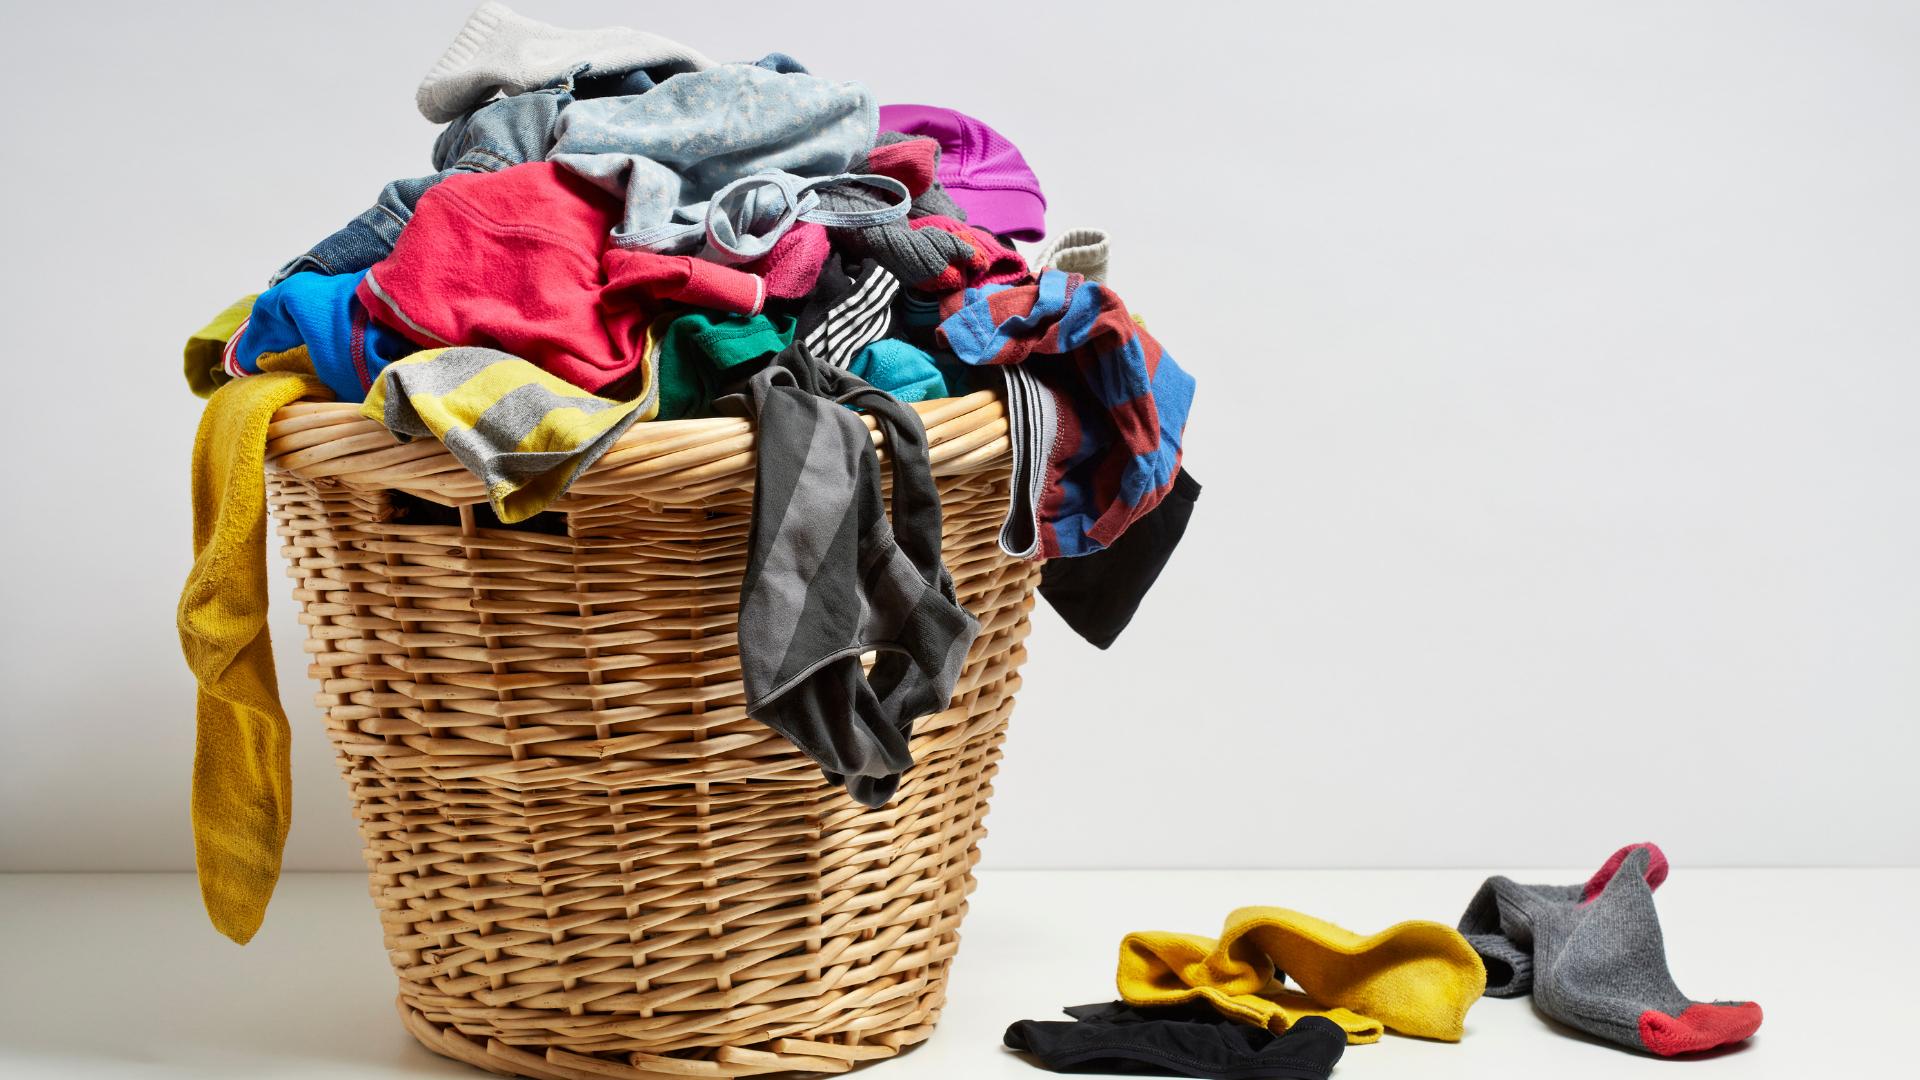 Where Do Your Clothes Live?